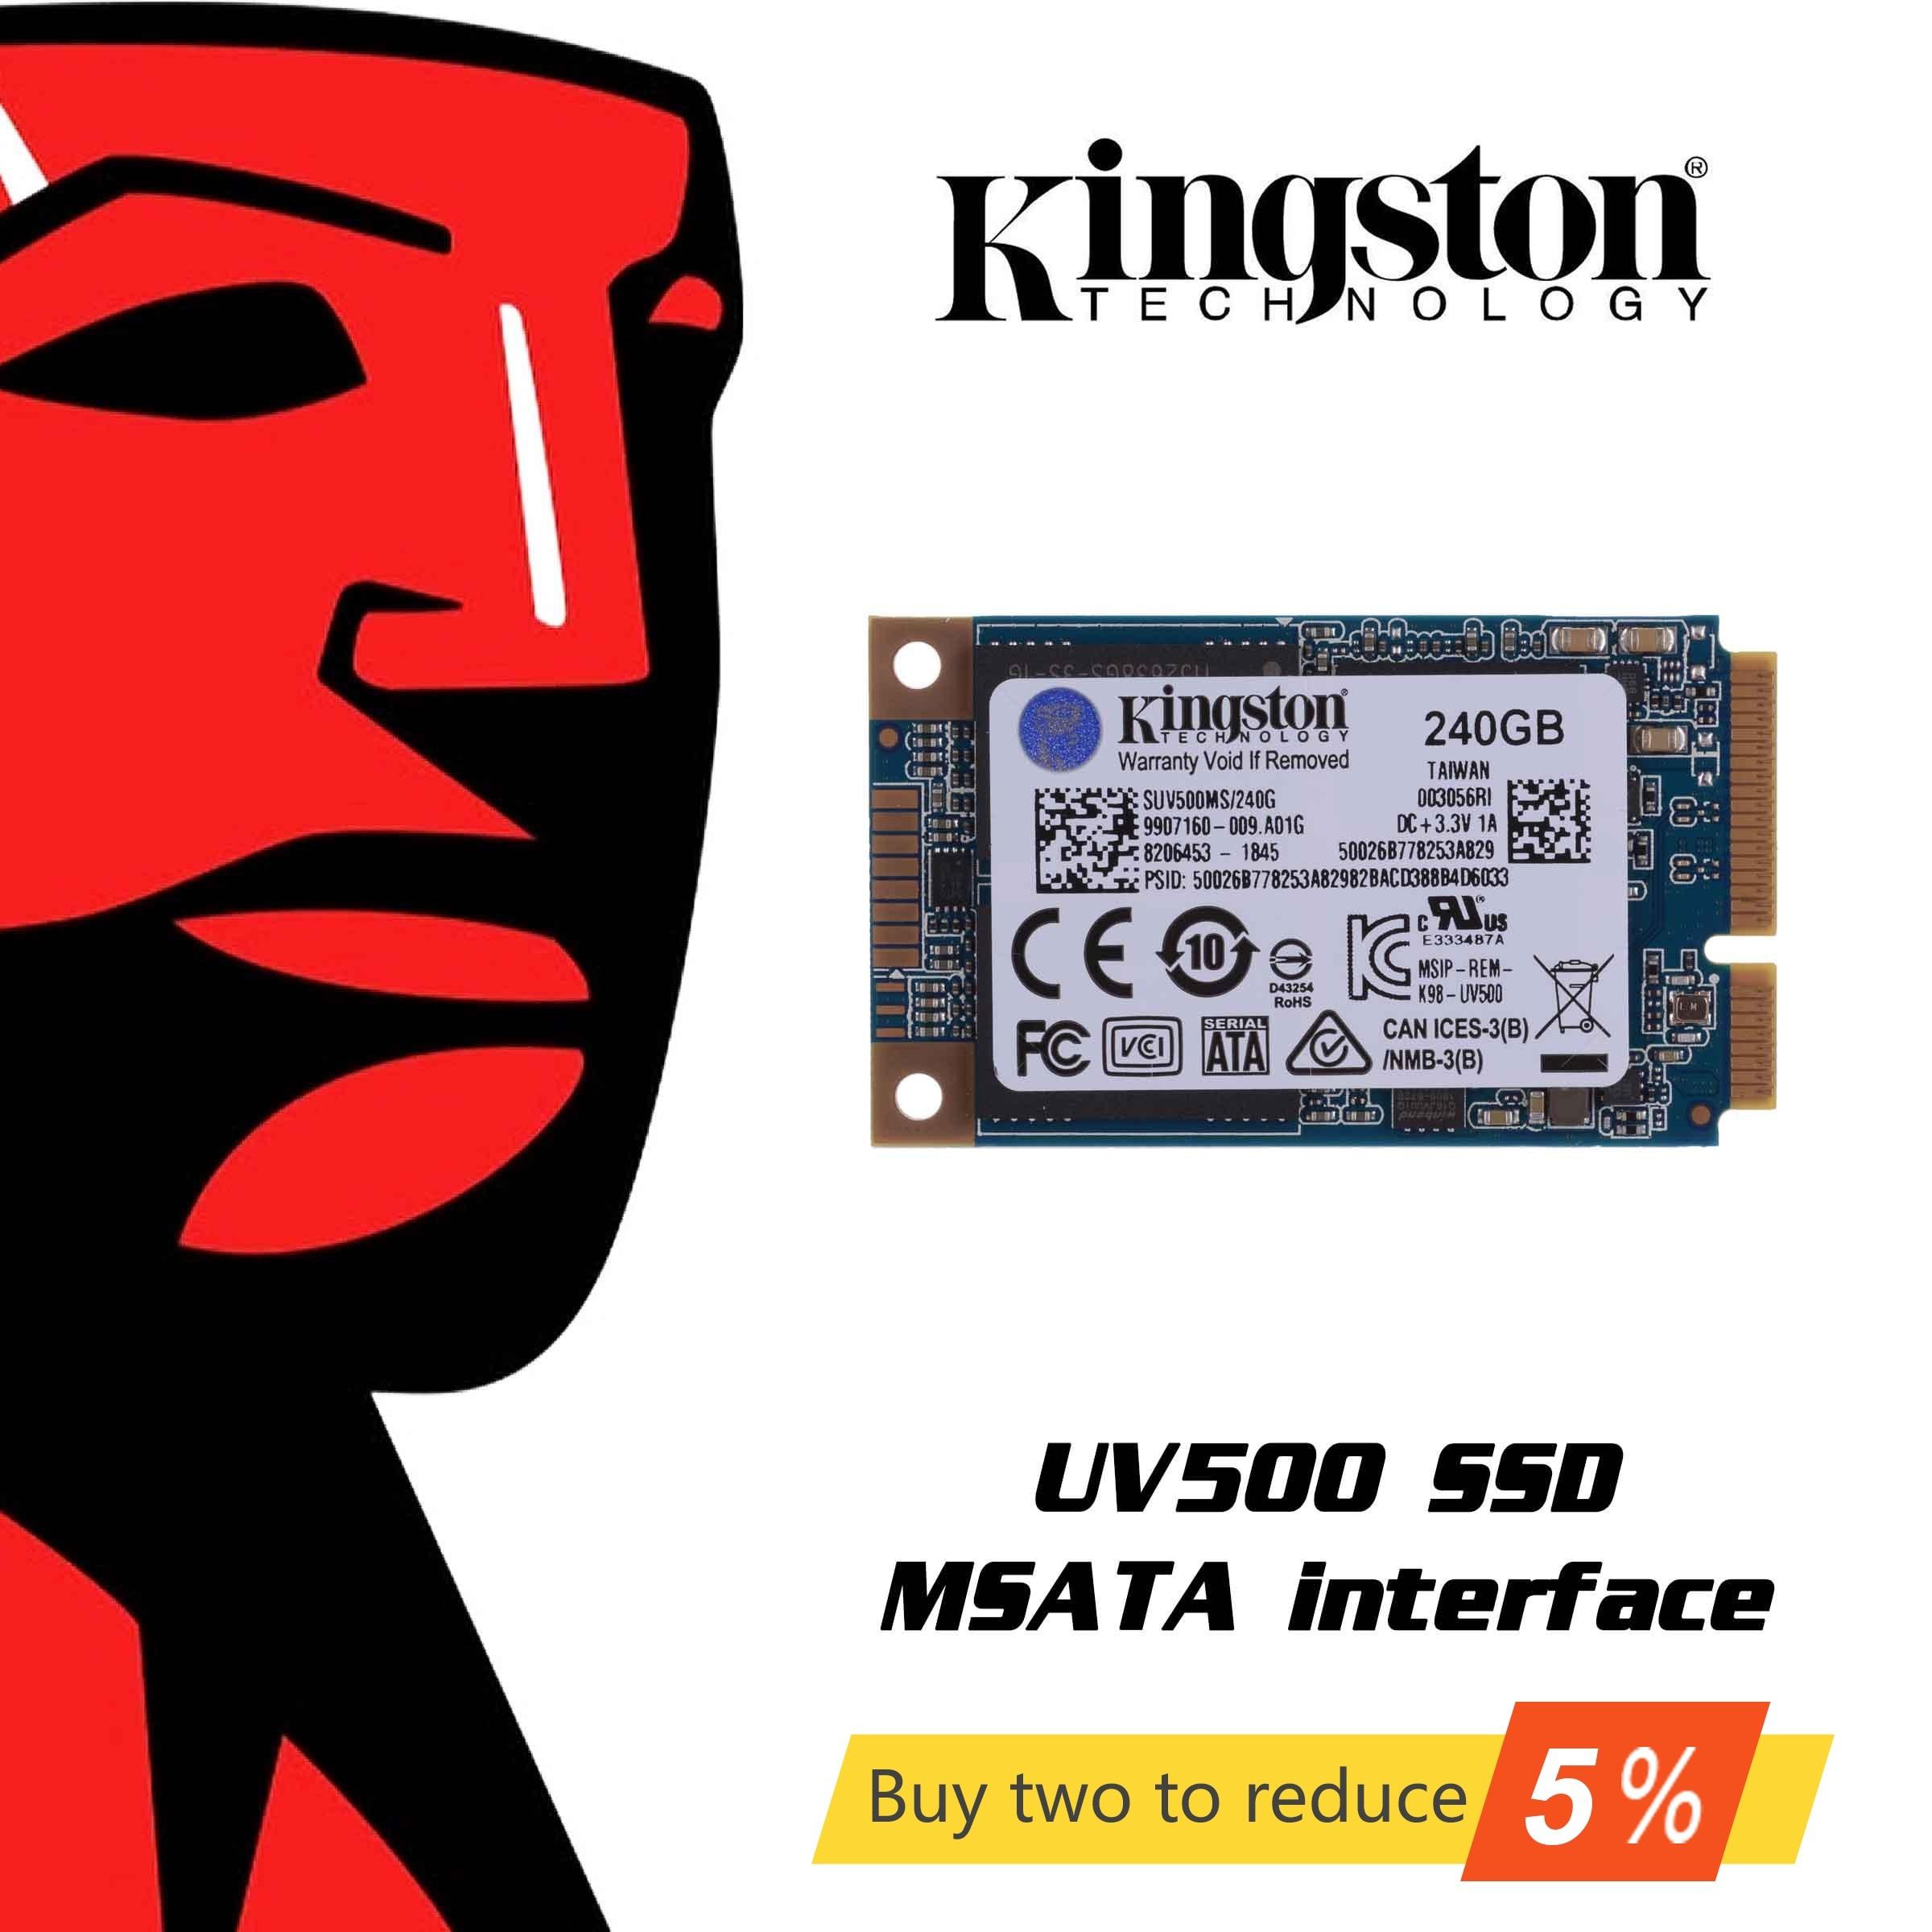 D'origine Kingston UV500 SSD 120 GB 240 GB hdd 480 GB 1.92 tb mSATA Interne Solid State Drive Disque Dur Disque HD SSD Pour ordinateur portable